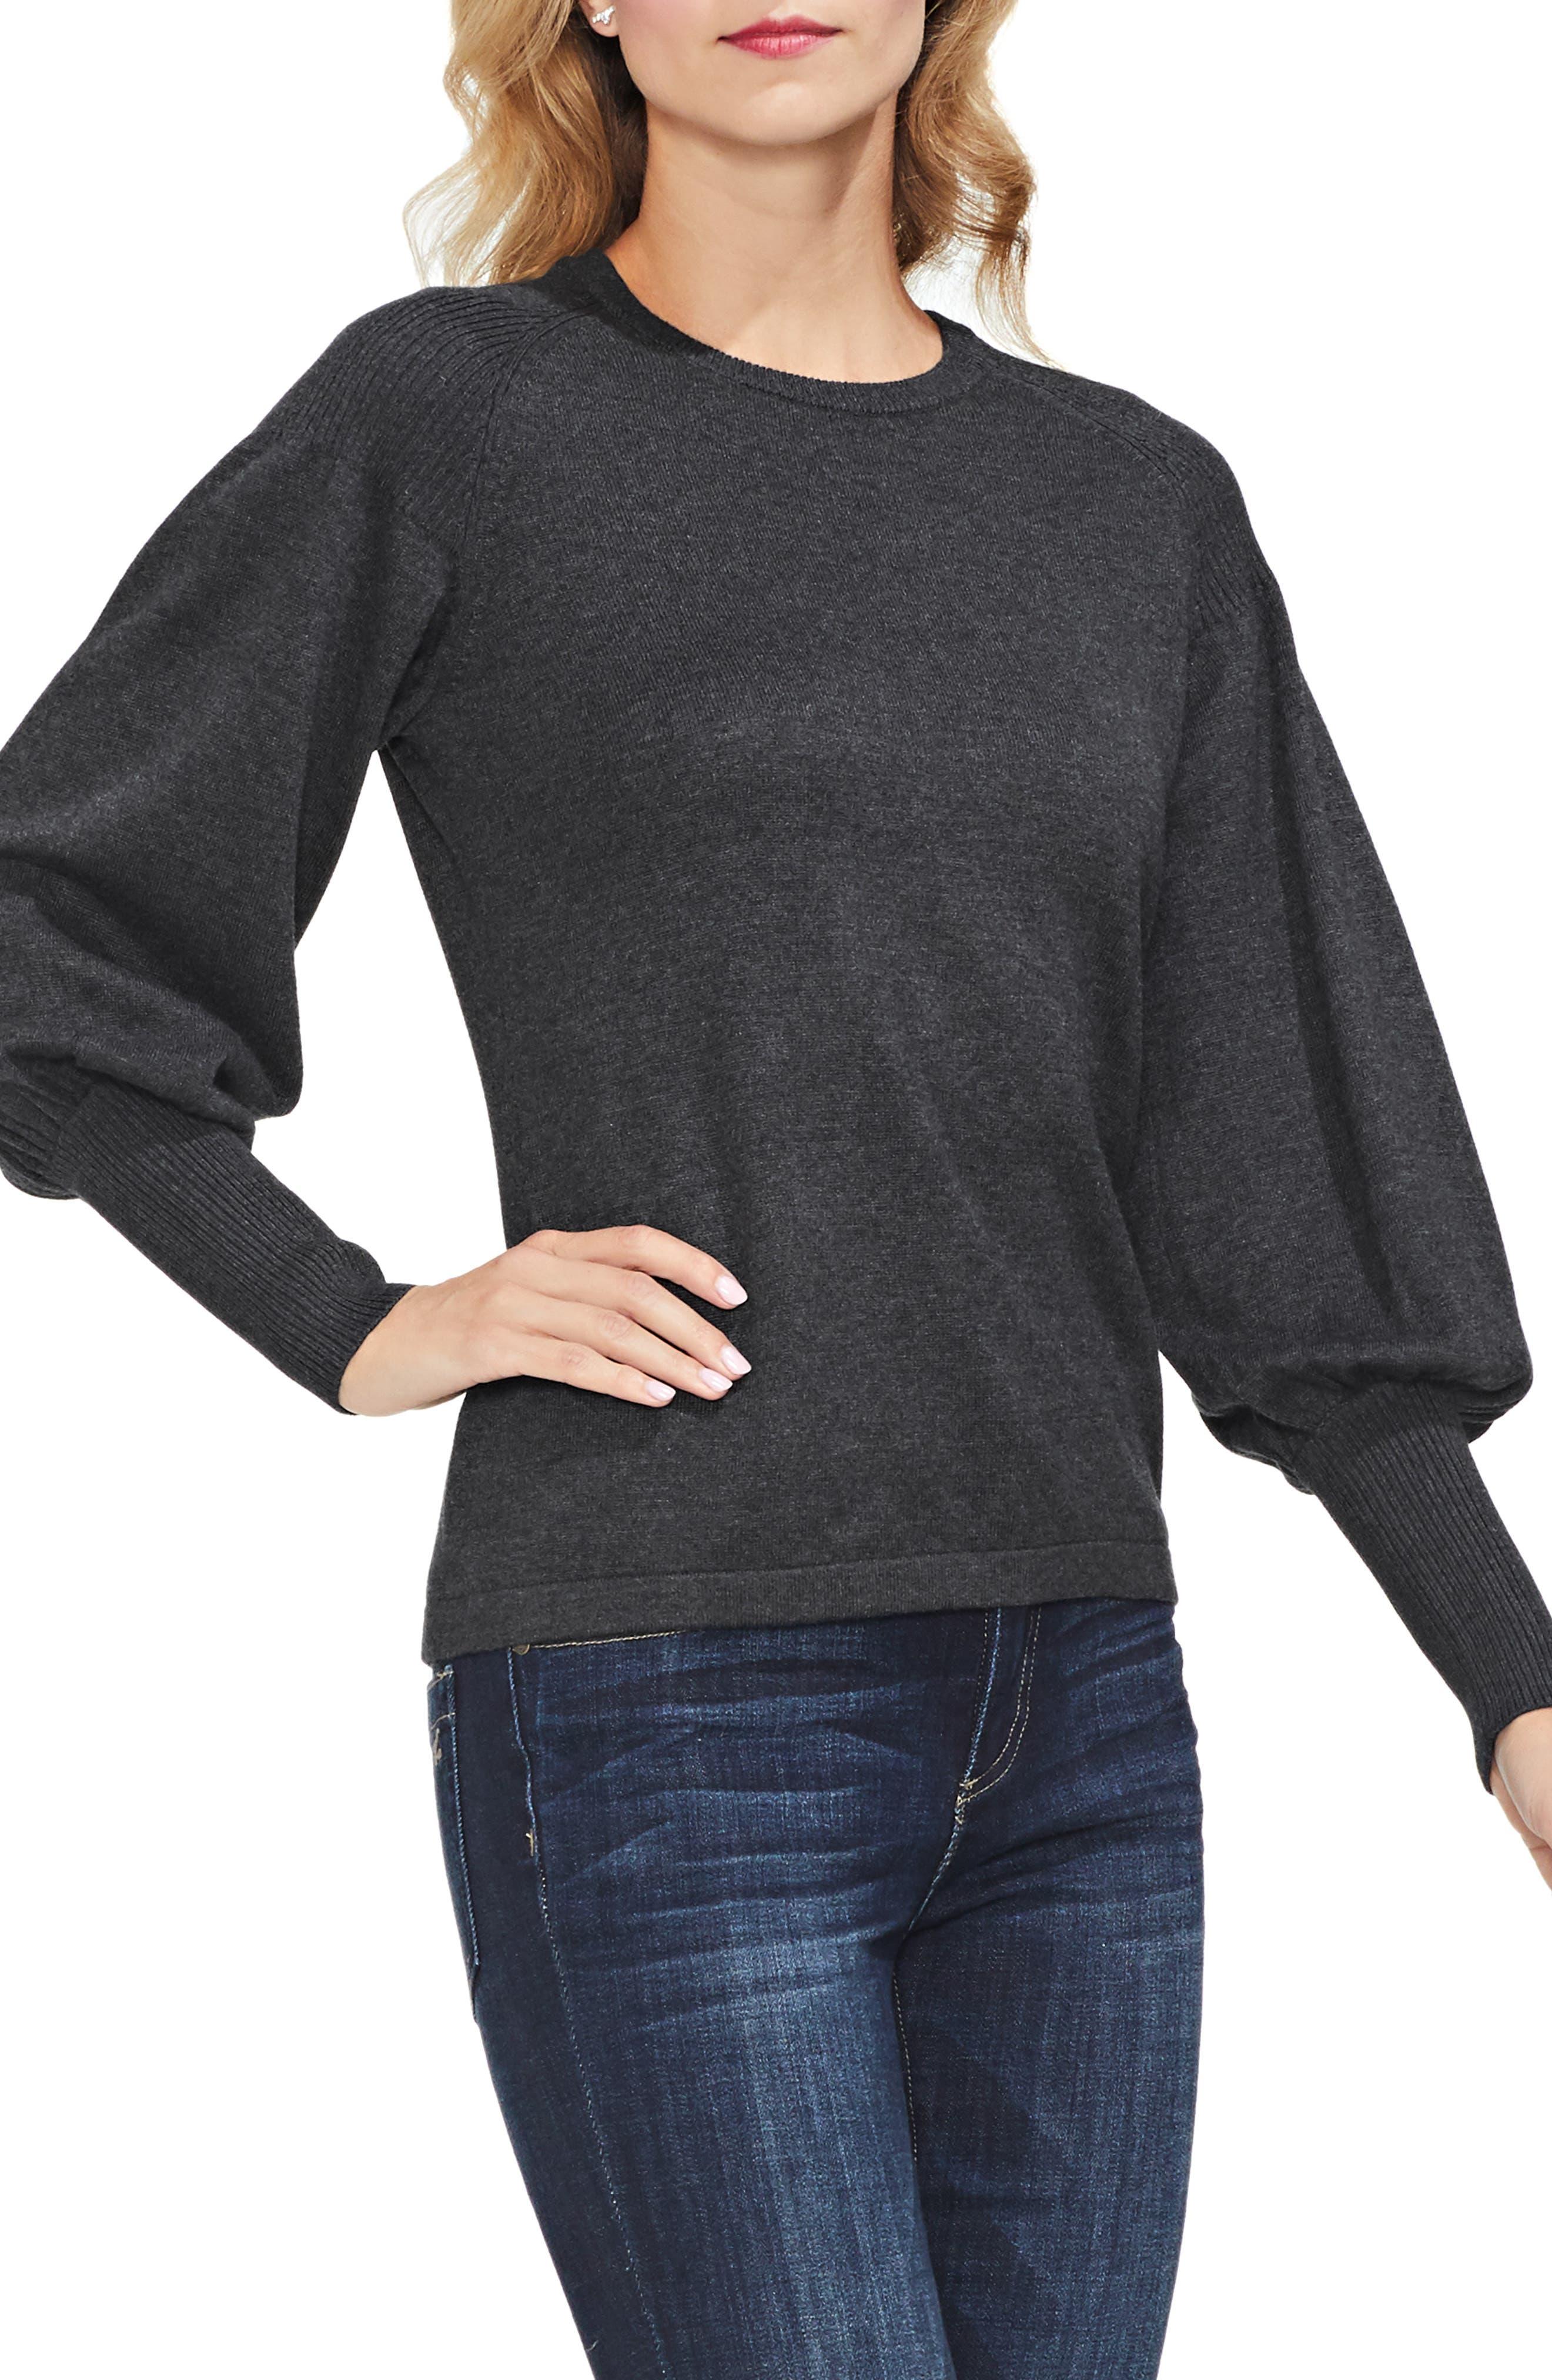 Blouson Sleeve Sweater,                         Main,                         color, MED HEATHER GREY